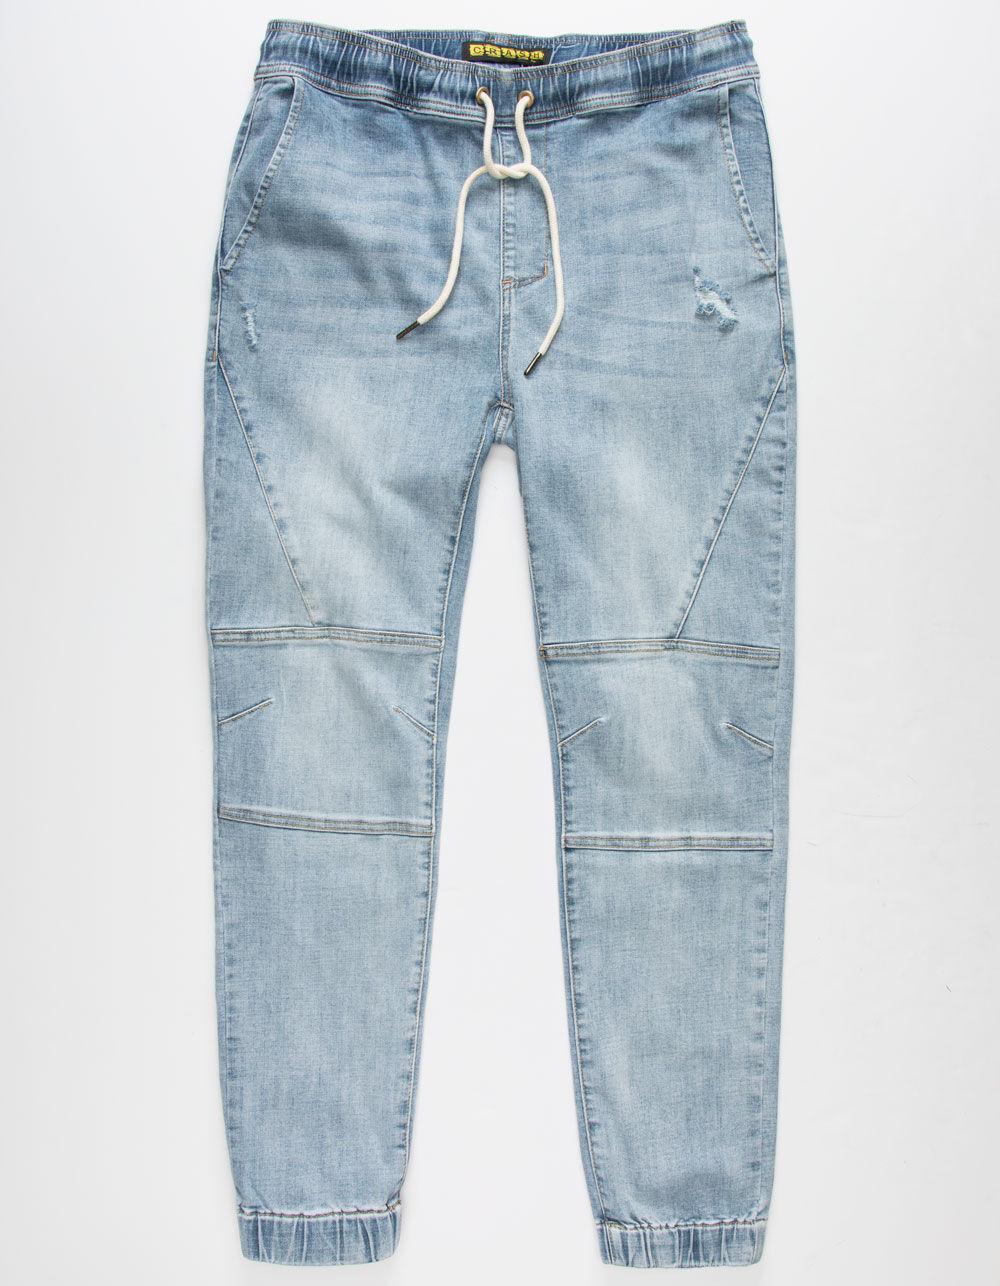 Image of CRASH Denim Jogger Pants